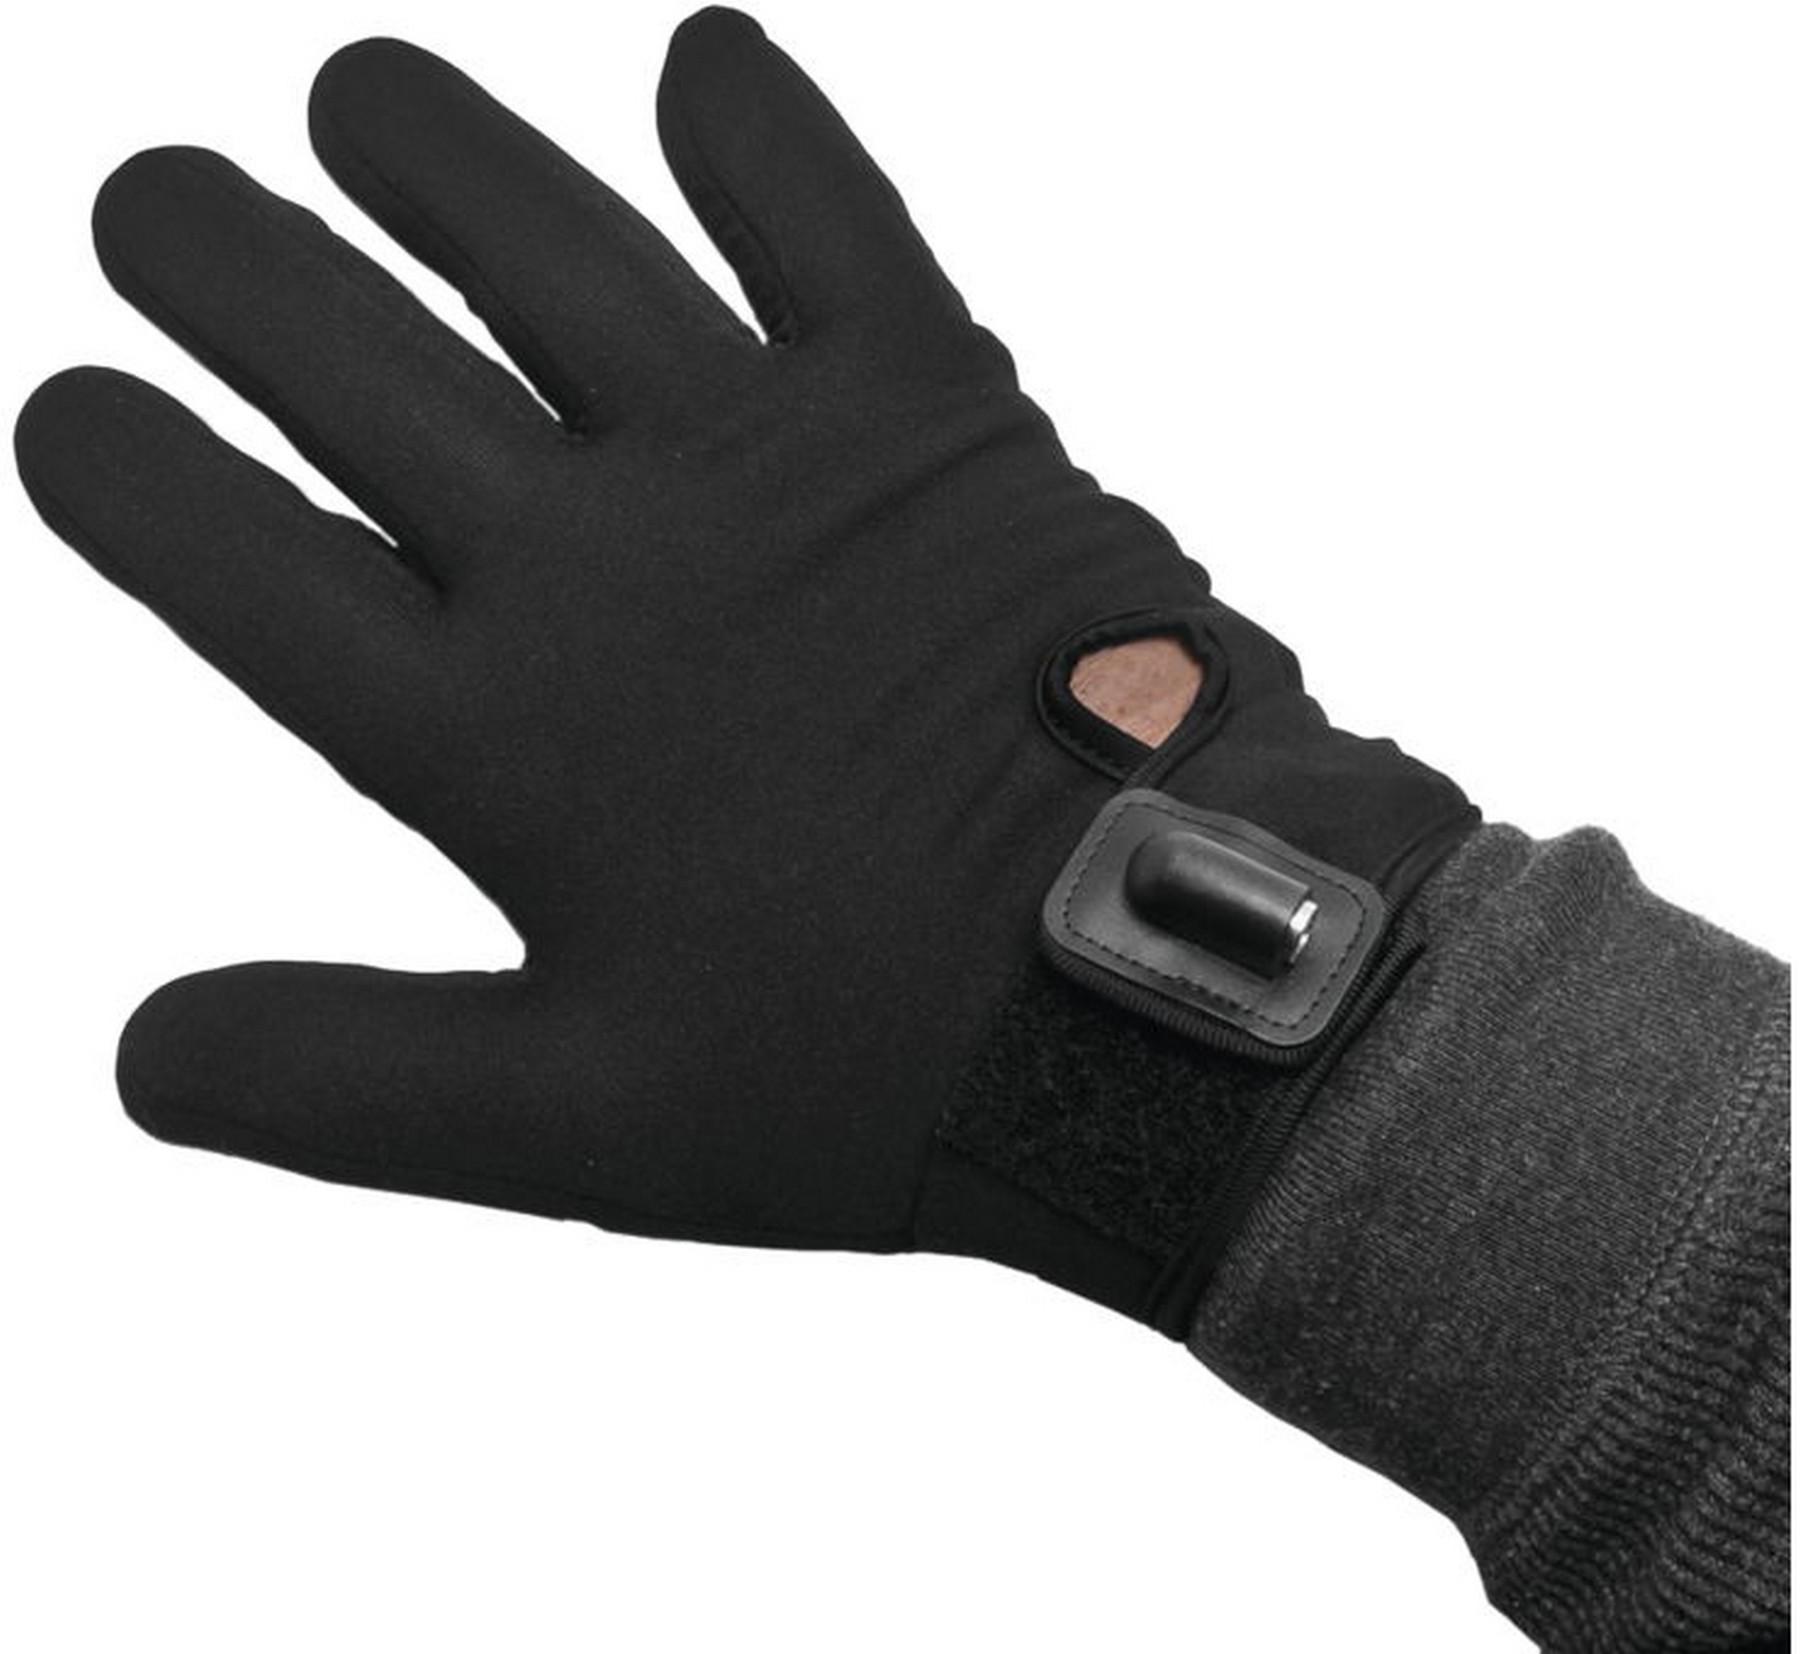 Medium//Large Tourmaster Synergy Pro-Plus Heated Glove Liners Black